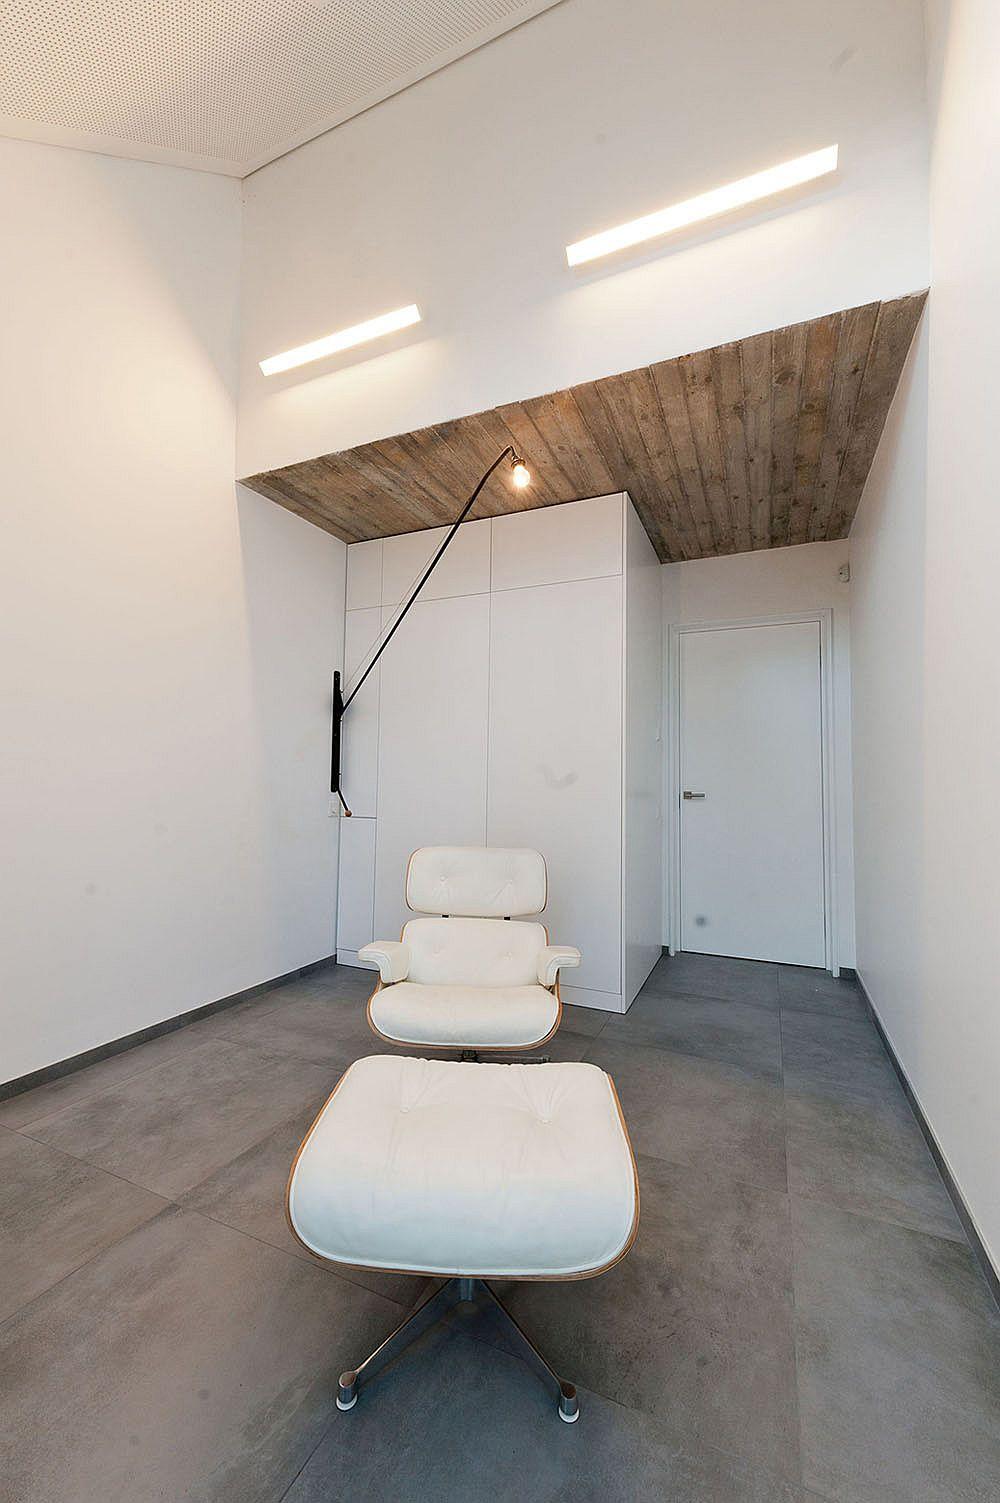 Sleek interiors of the house where the shelves melt into the backdrop